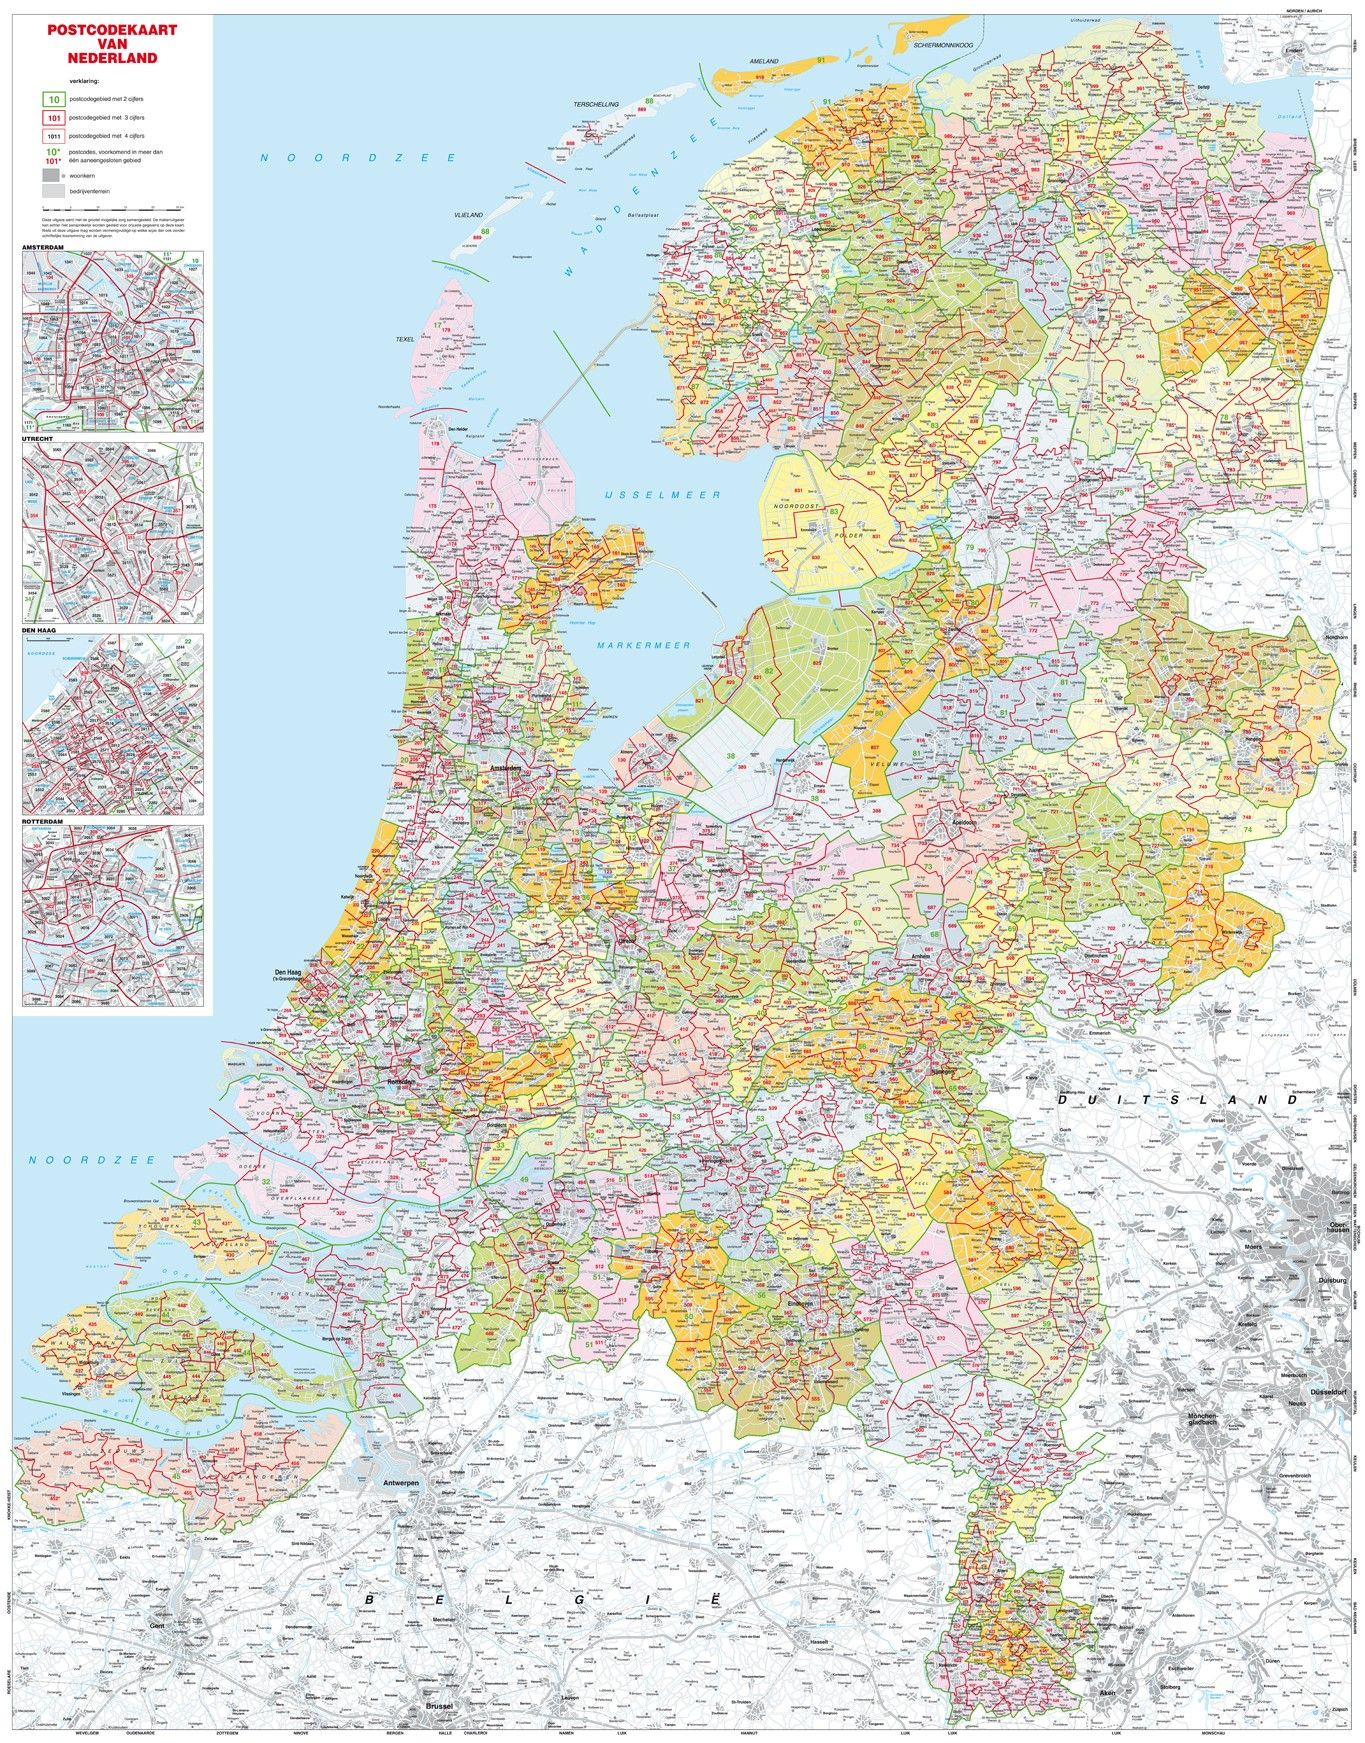 Digitale Postcodekaart van Nederland 3 cijferig 1:250.000 400dpi